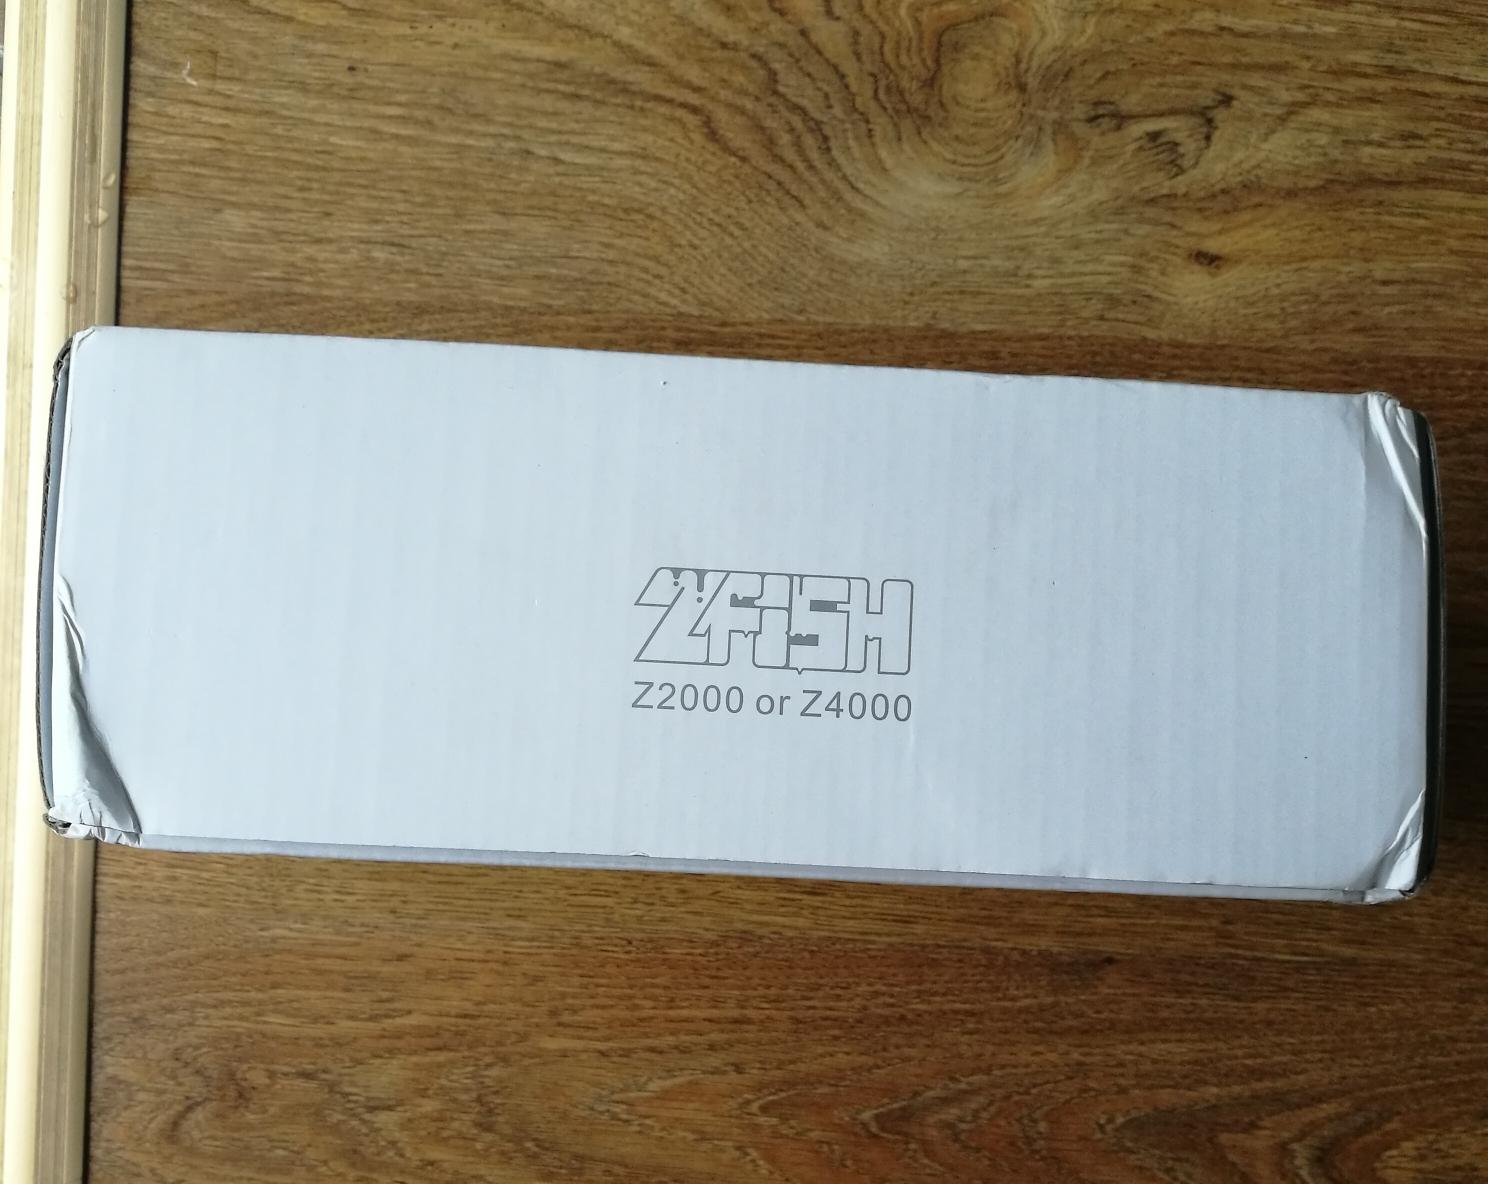 ZFISH变频水泵试用报告 北京龙鱼论坛 北京龙鱼第34张